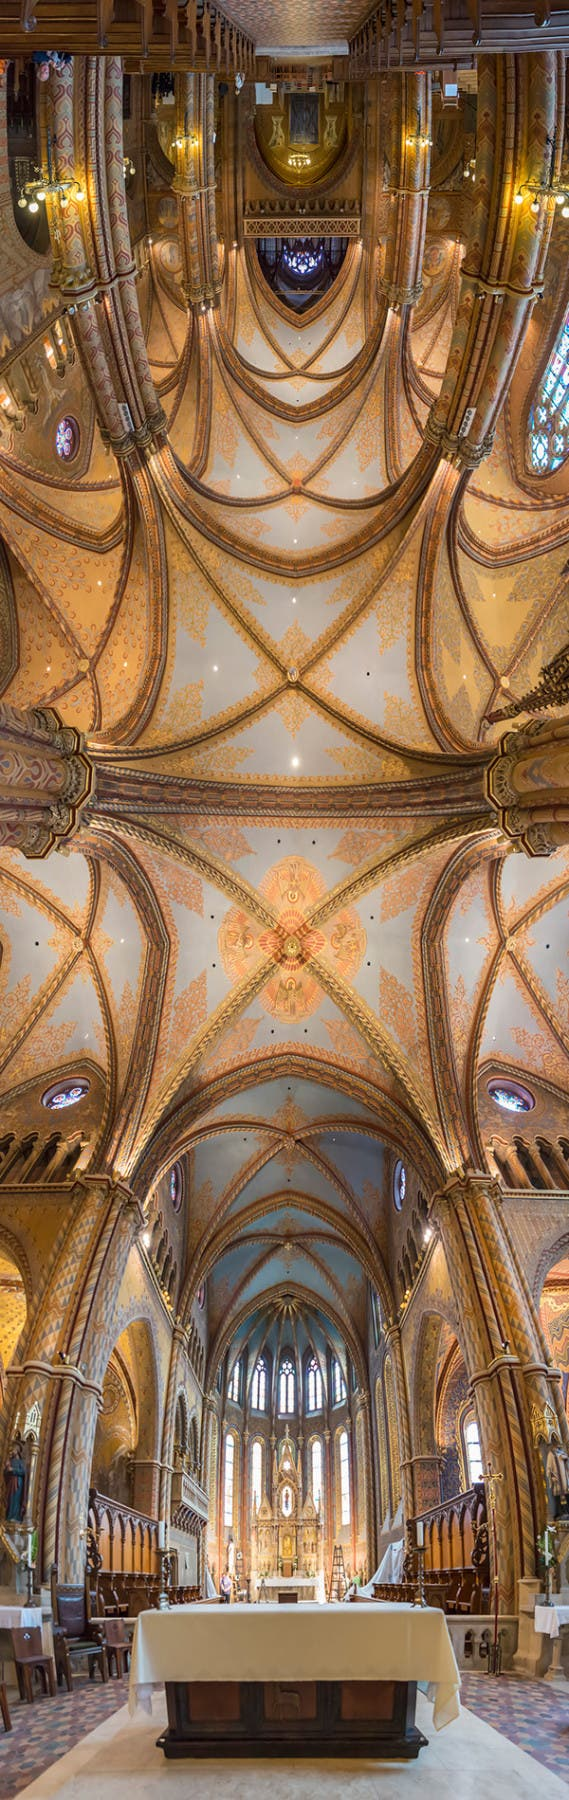 techos-de-iglesias-4